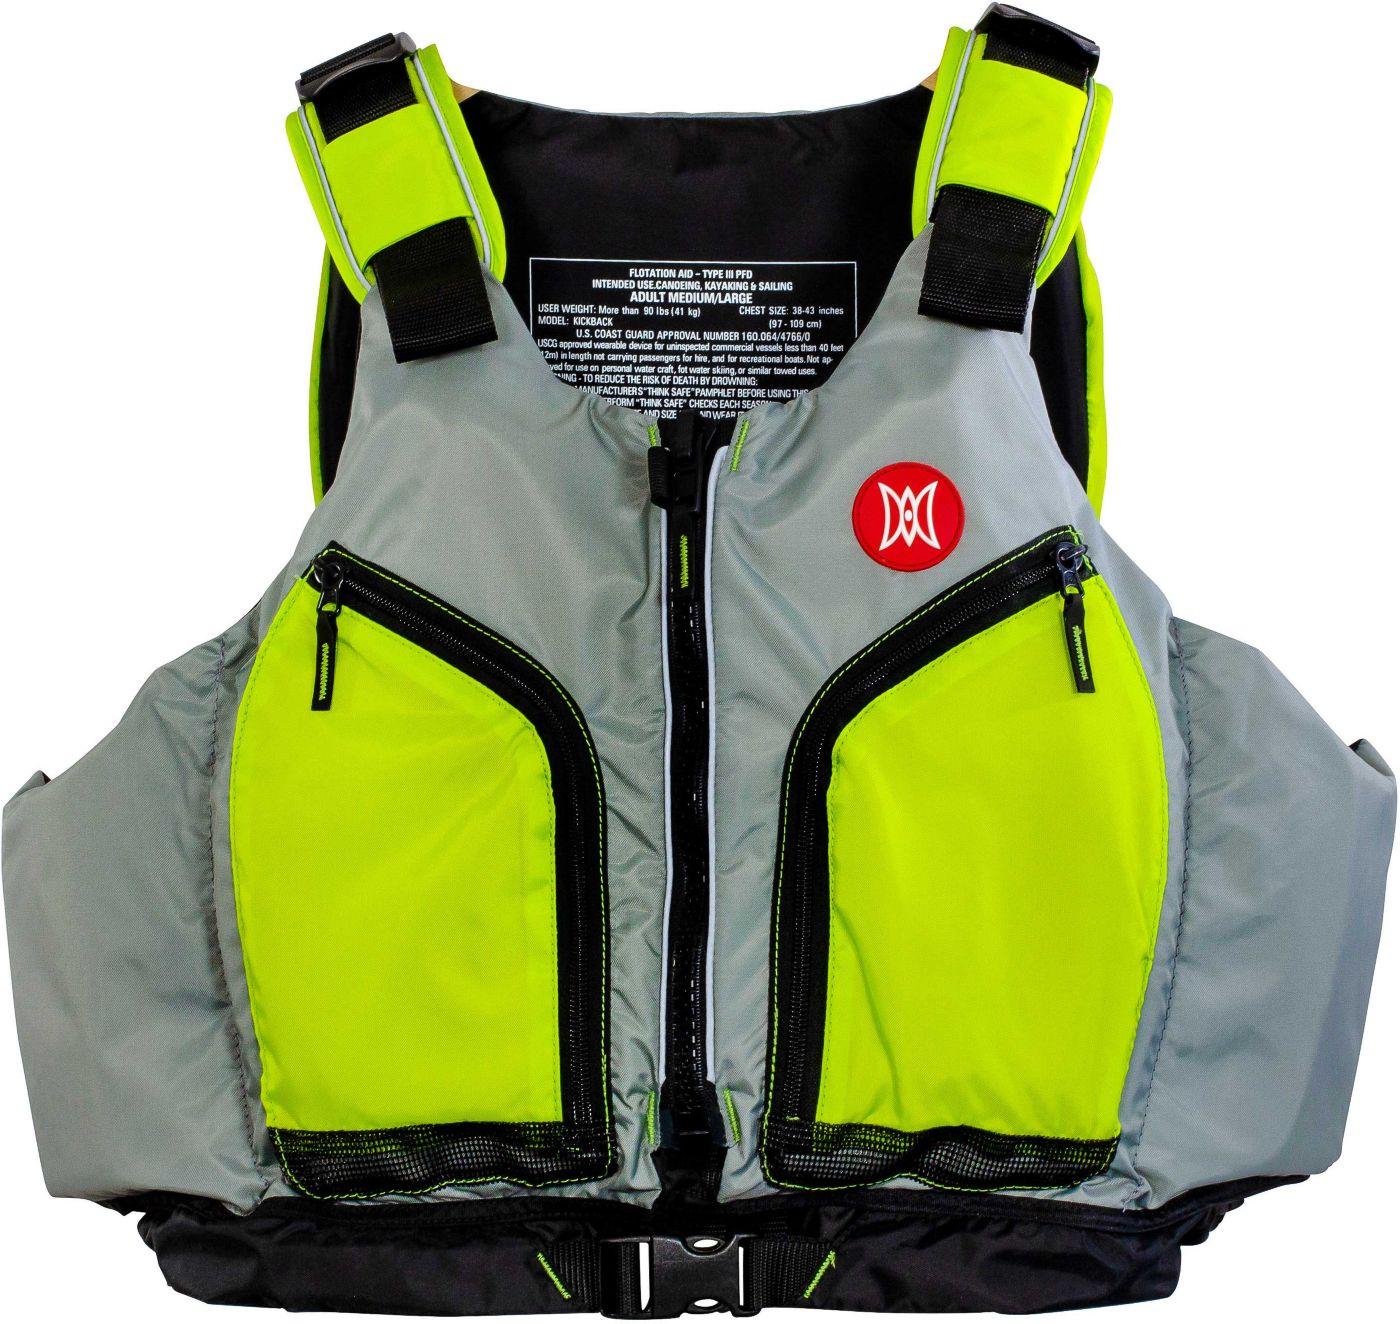 Perception Adult Hi-Fi Life Vest